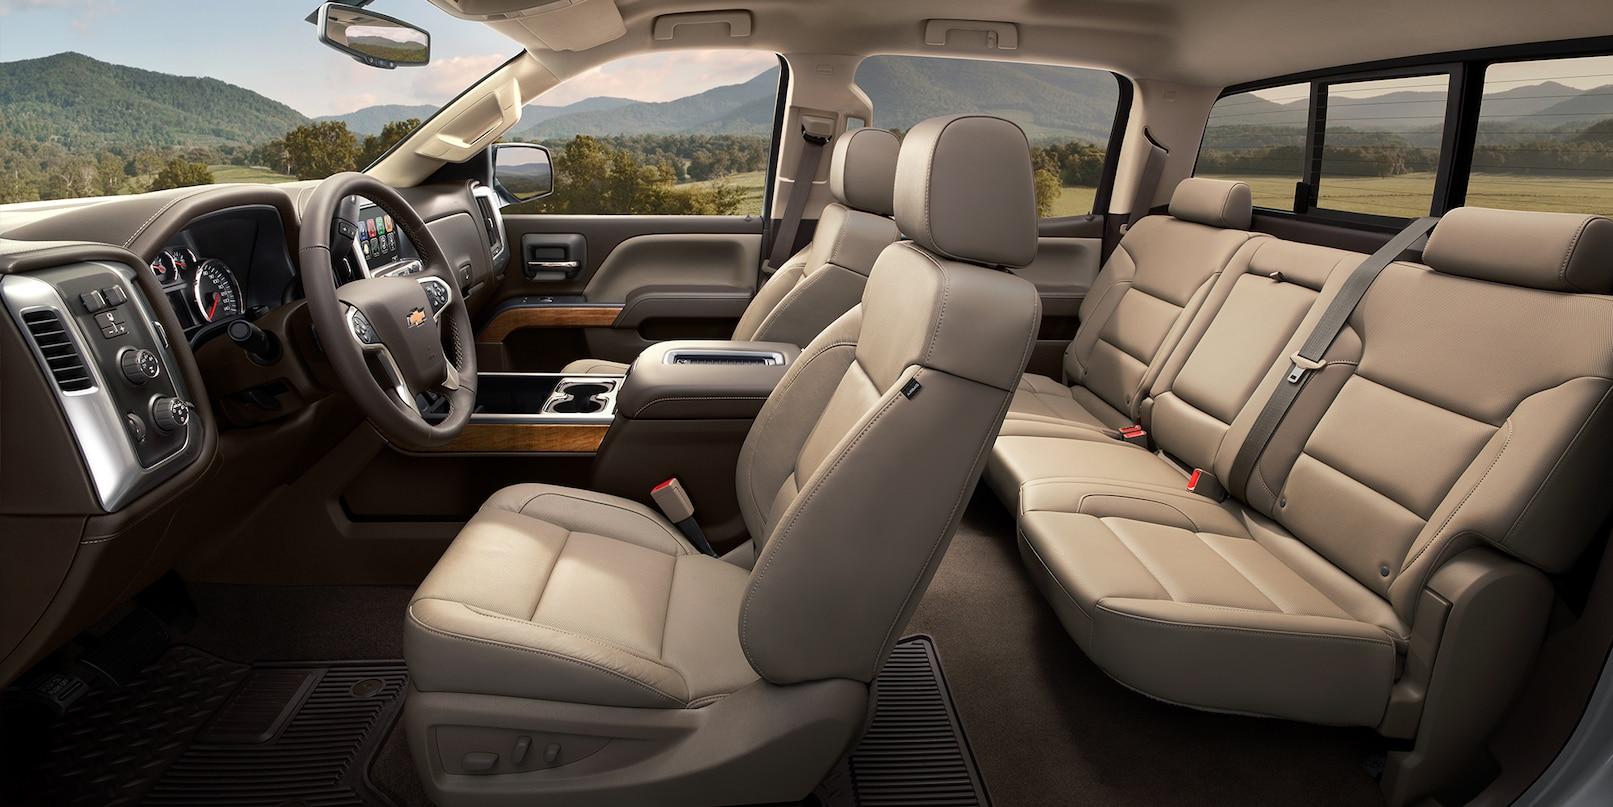 2019 Chevrolet Silverado 1500 Full Seating